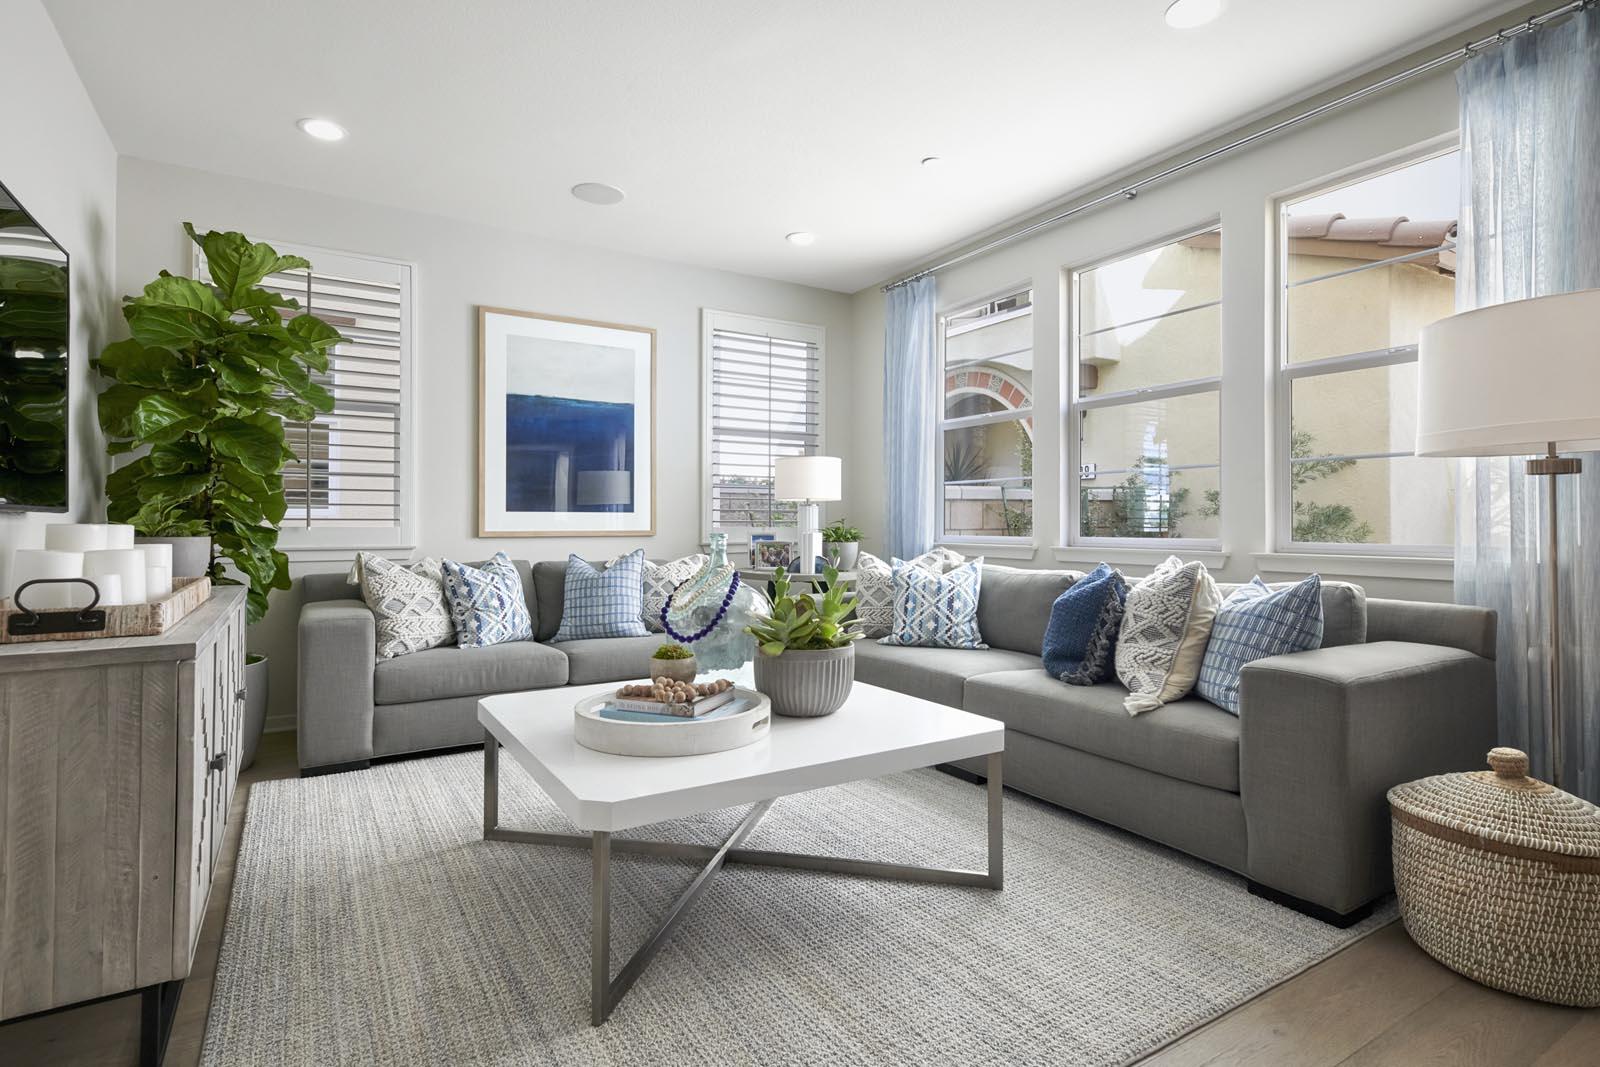 Great Room   Residence 3   Lumin   New Homes in Rancho Cucamonga, CA   Van Daele Homes